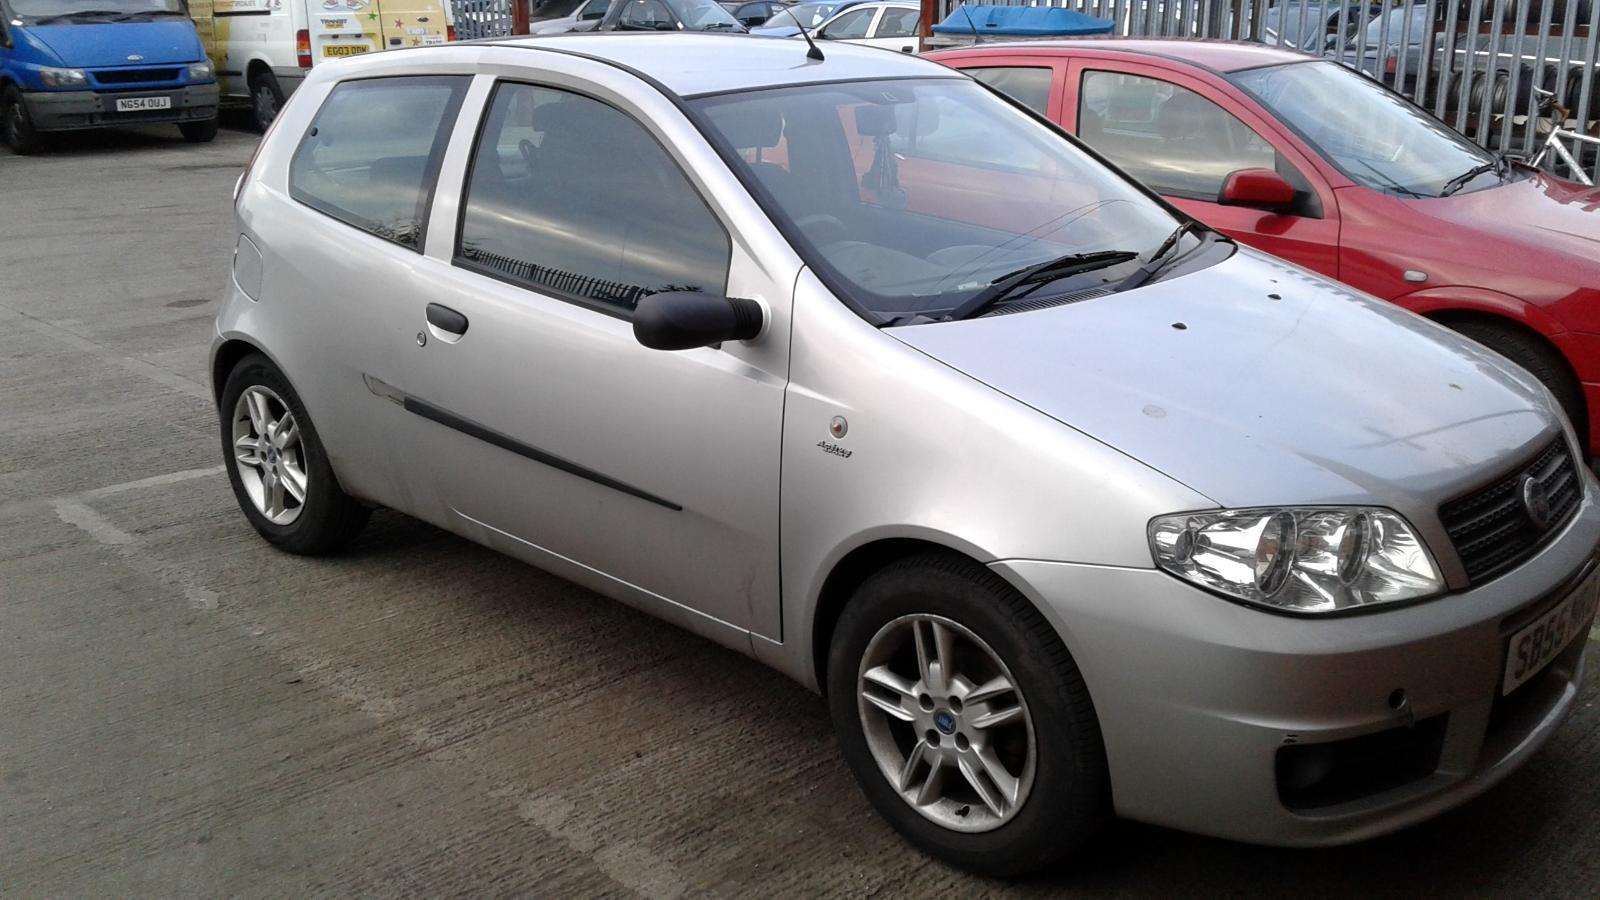 2006 Fiat Punto Mk2 15 U0026quot  Inch Spare 4 Stud Alloy Wheel 5